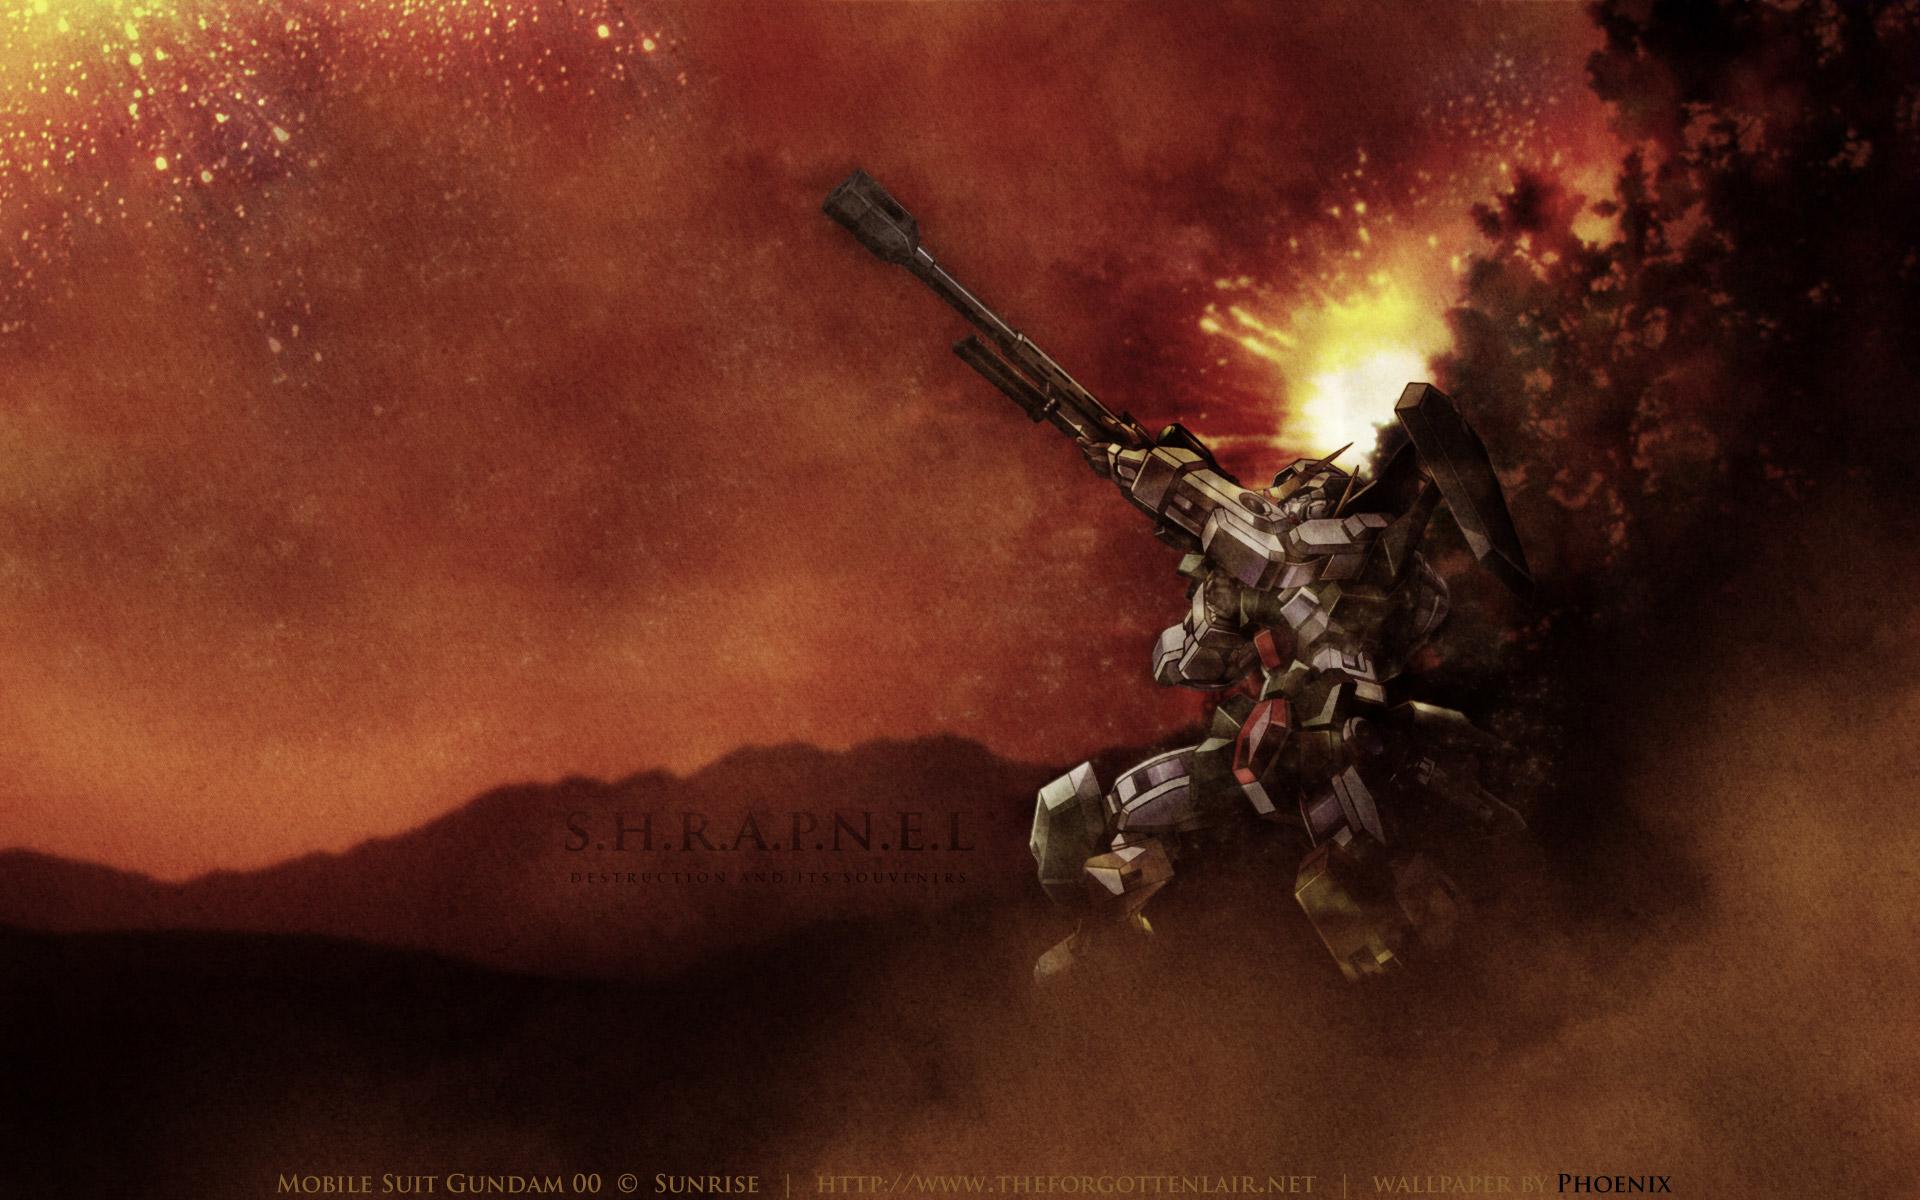 Mobile Suit Gundam 00 Desktop Wallpapers